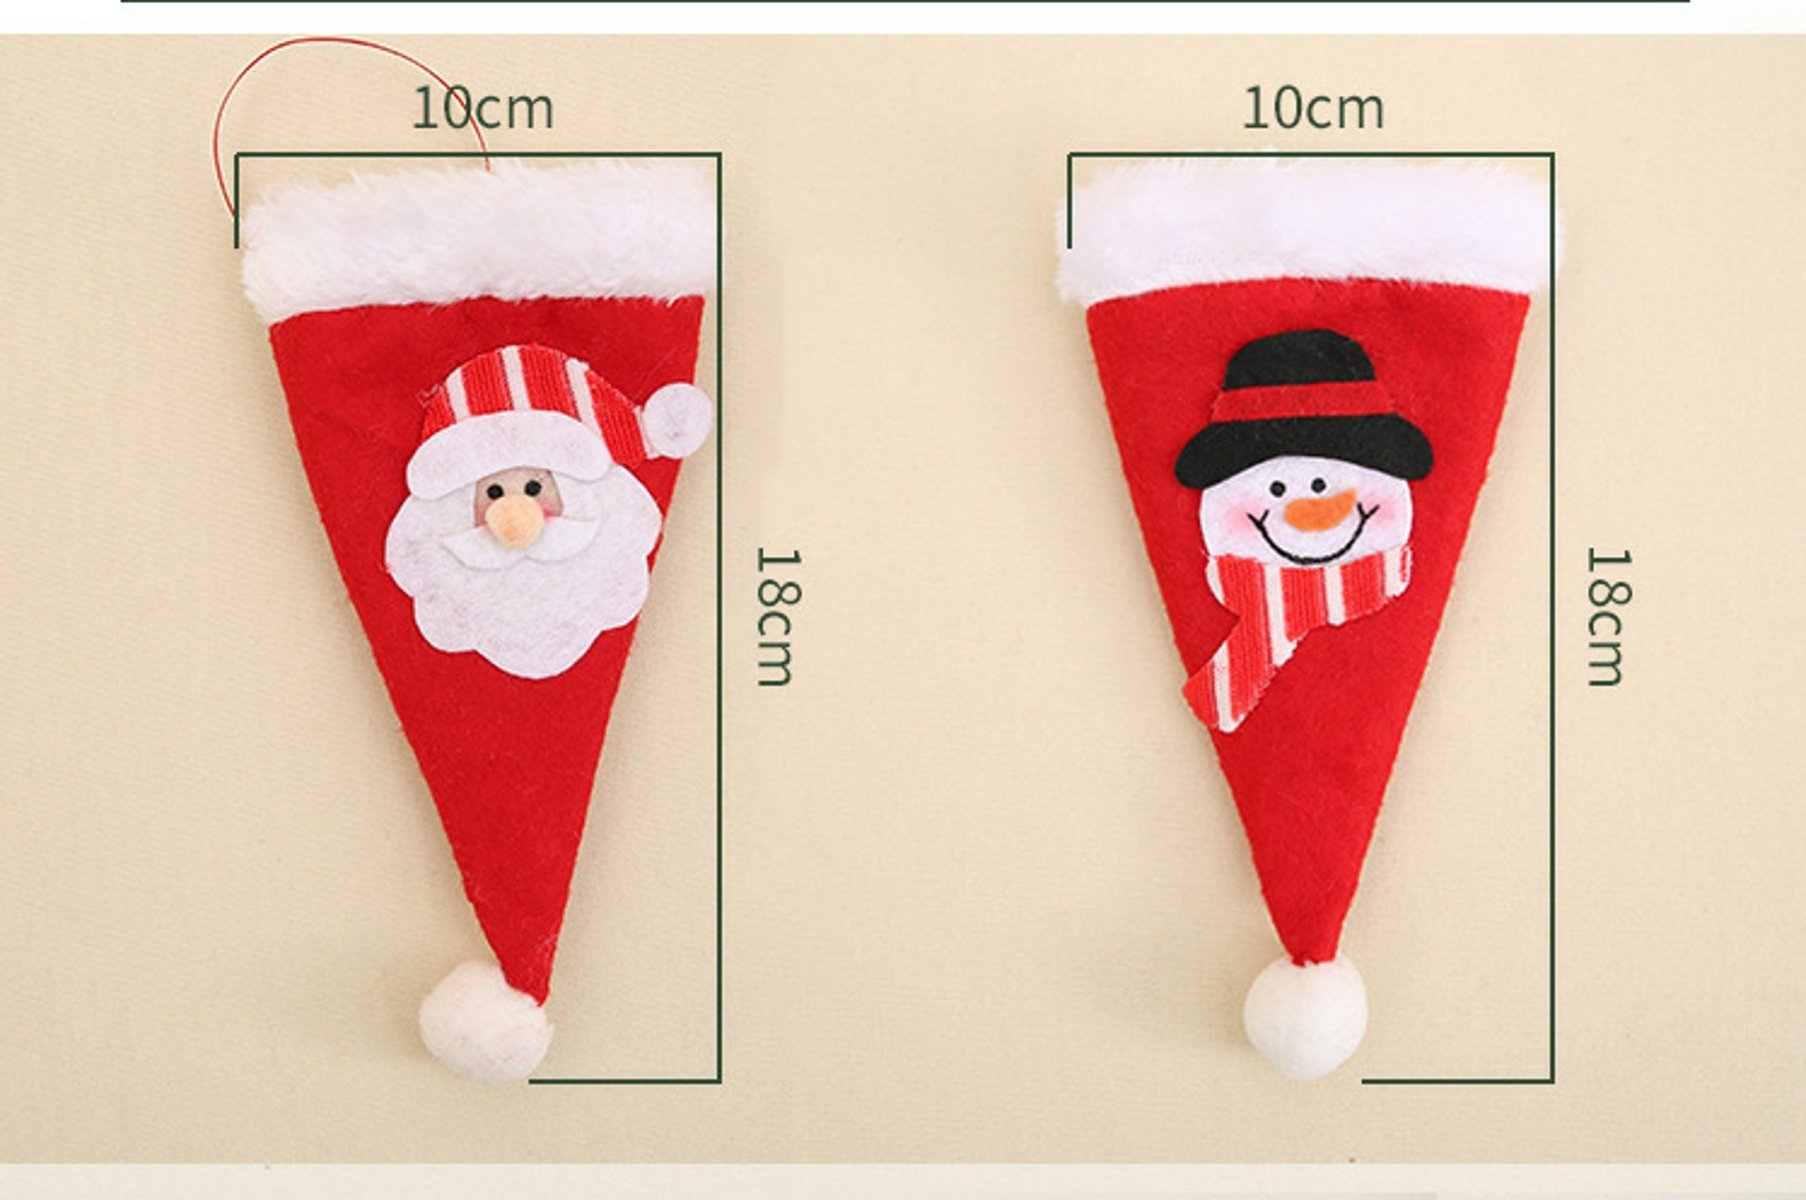 12pcs Christmas Silverware Holders Christmas Cutlery Bag Holders for Christmas Dinner Table Decoration(6pcs Santa Claus+6pcs Christmas Snowman)